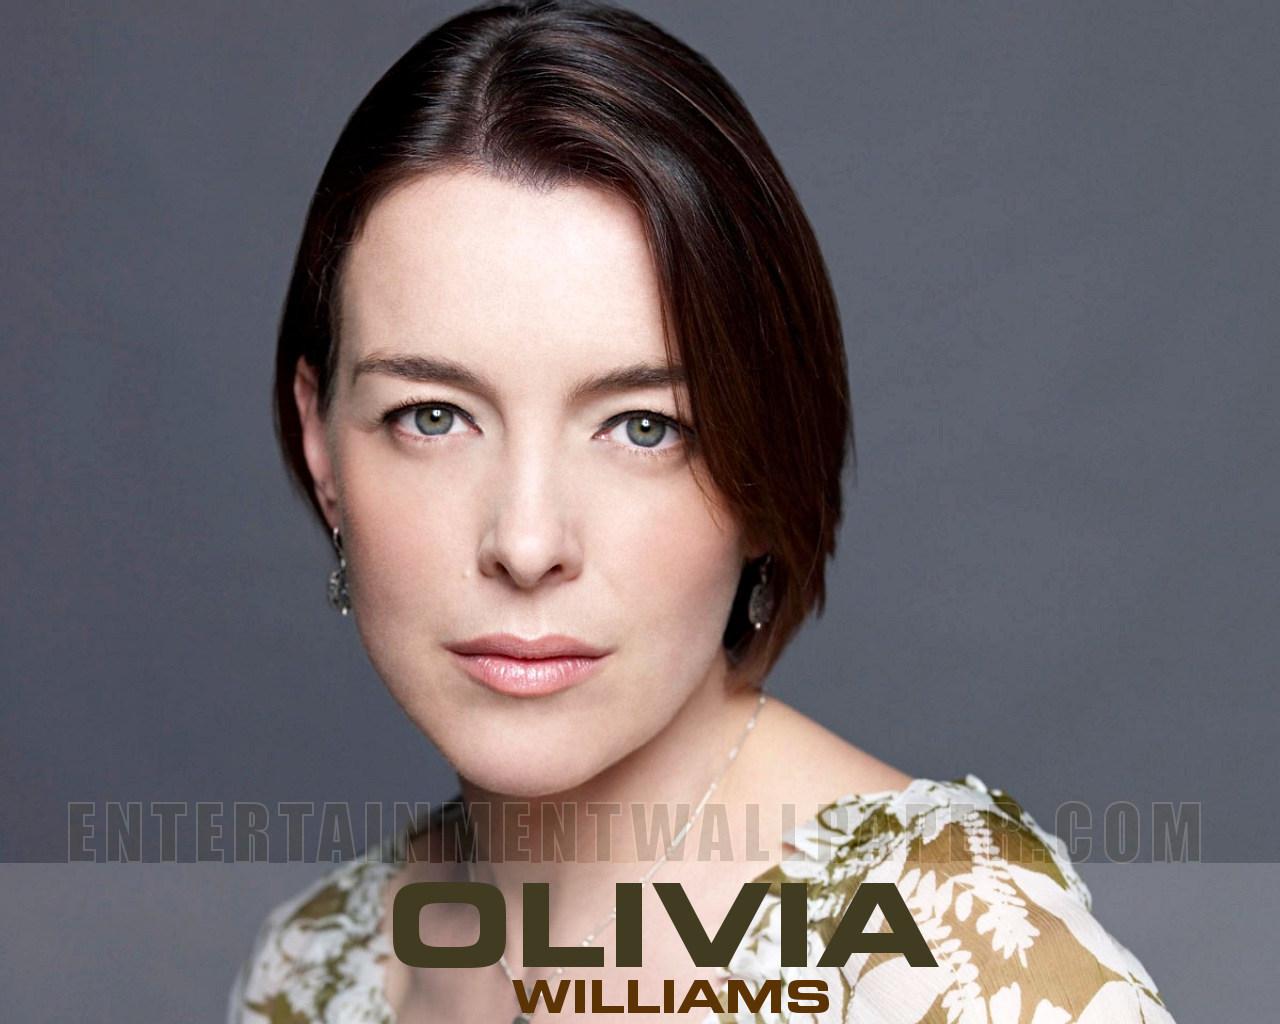 http://1.bp.blogspot.com/-PQxELNT60rA/TaY0hjqSzrI/AAAAAAAAEzk/E3y_TPGrTjA/s1600/olivia.jpg